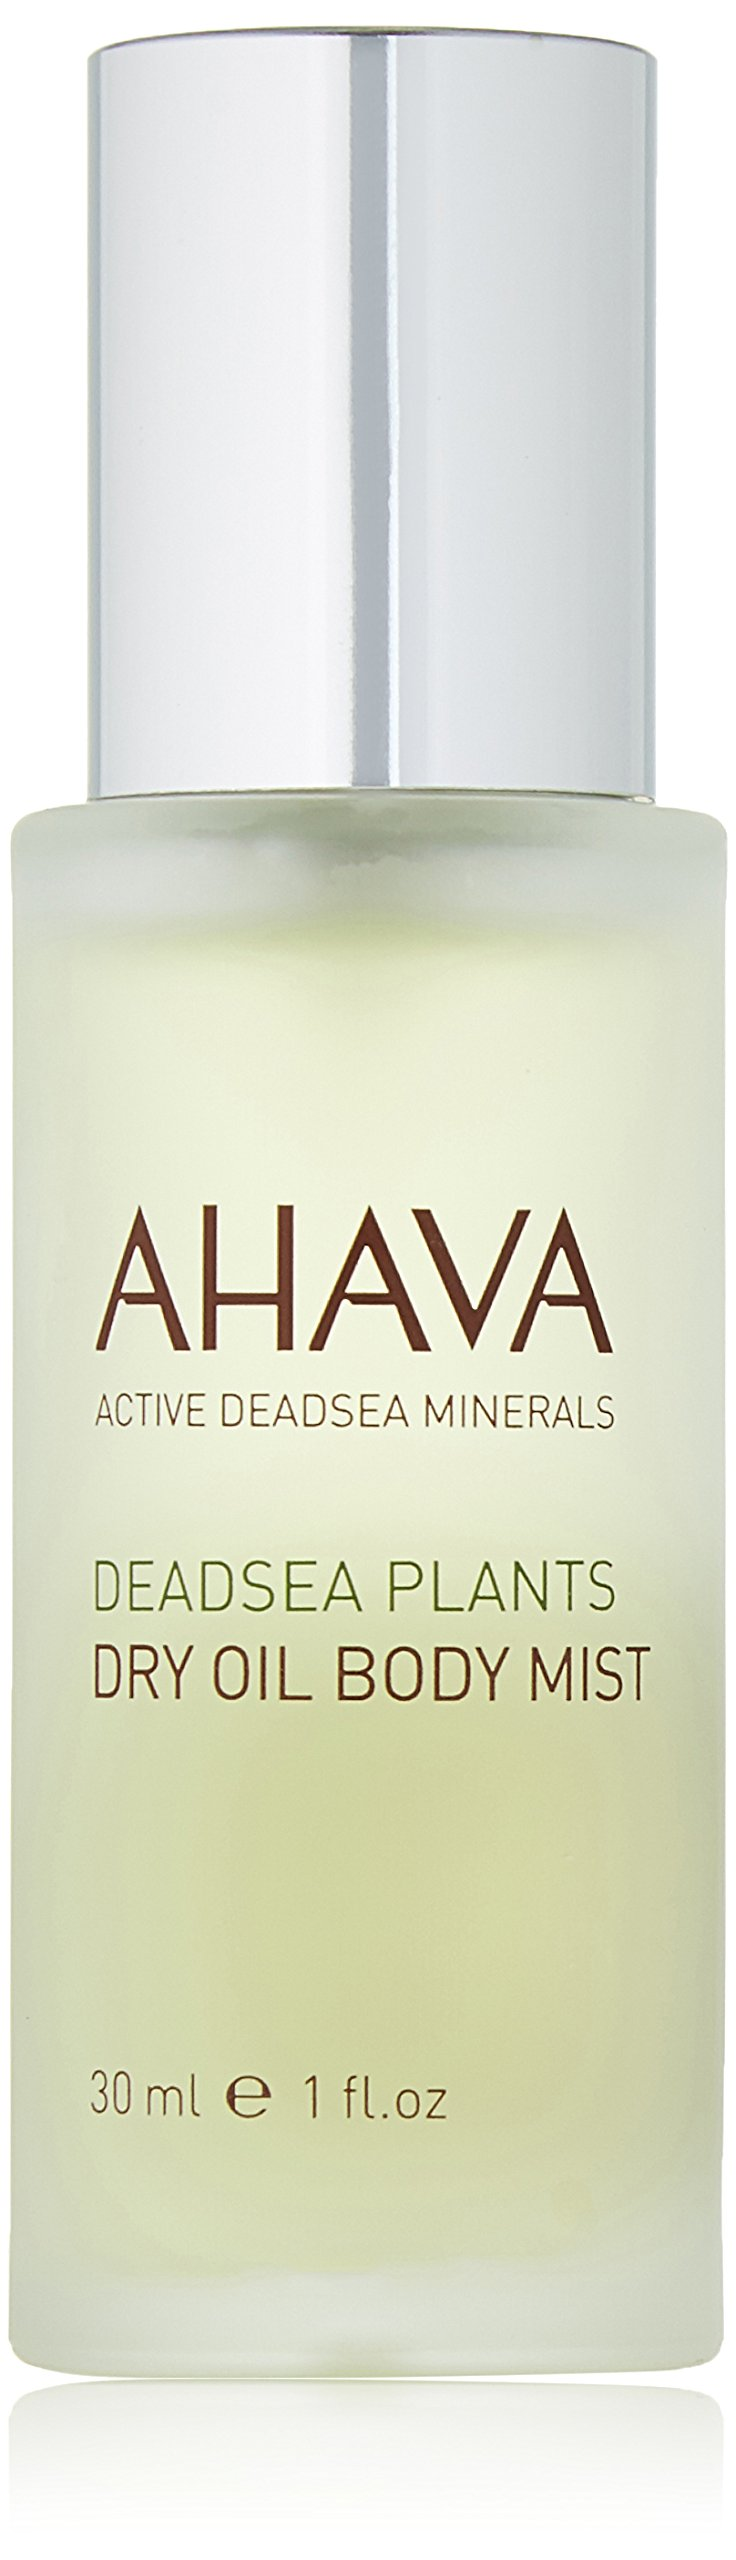 AHAVA Dry Oil Body Mist Travel Size, 1 fl. oz.